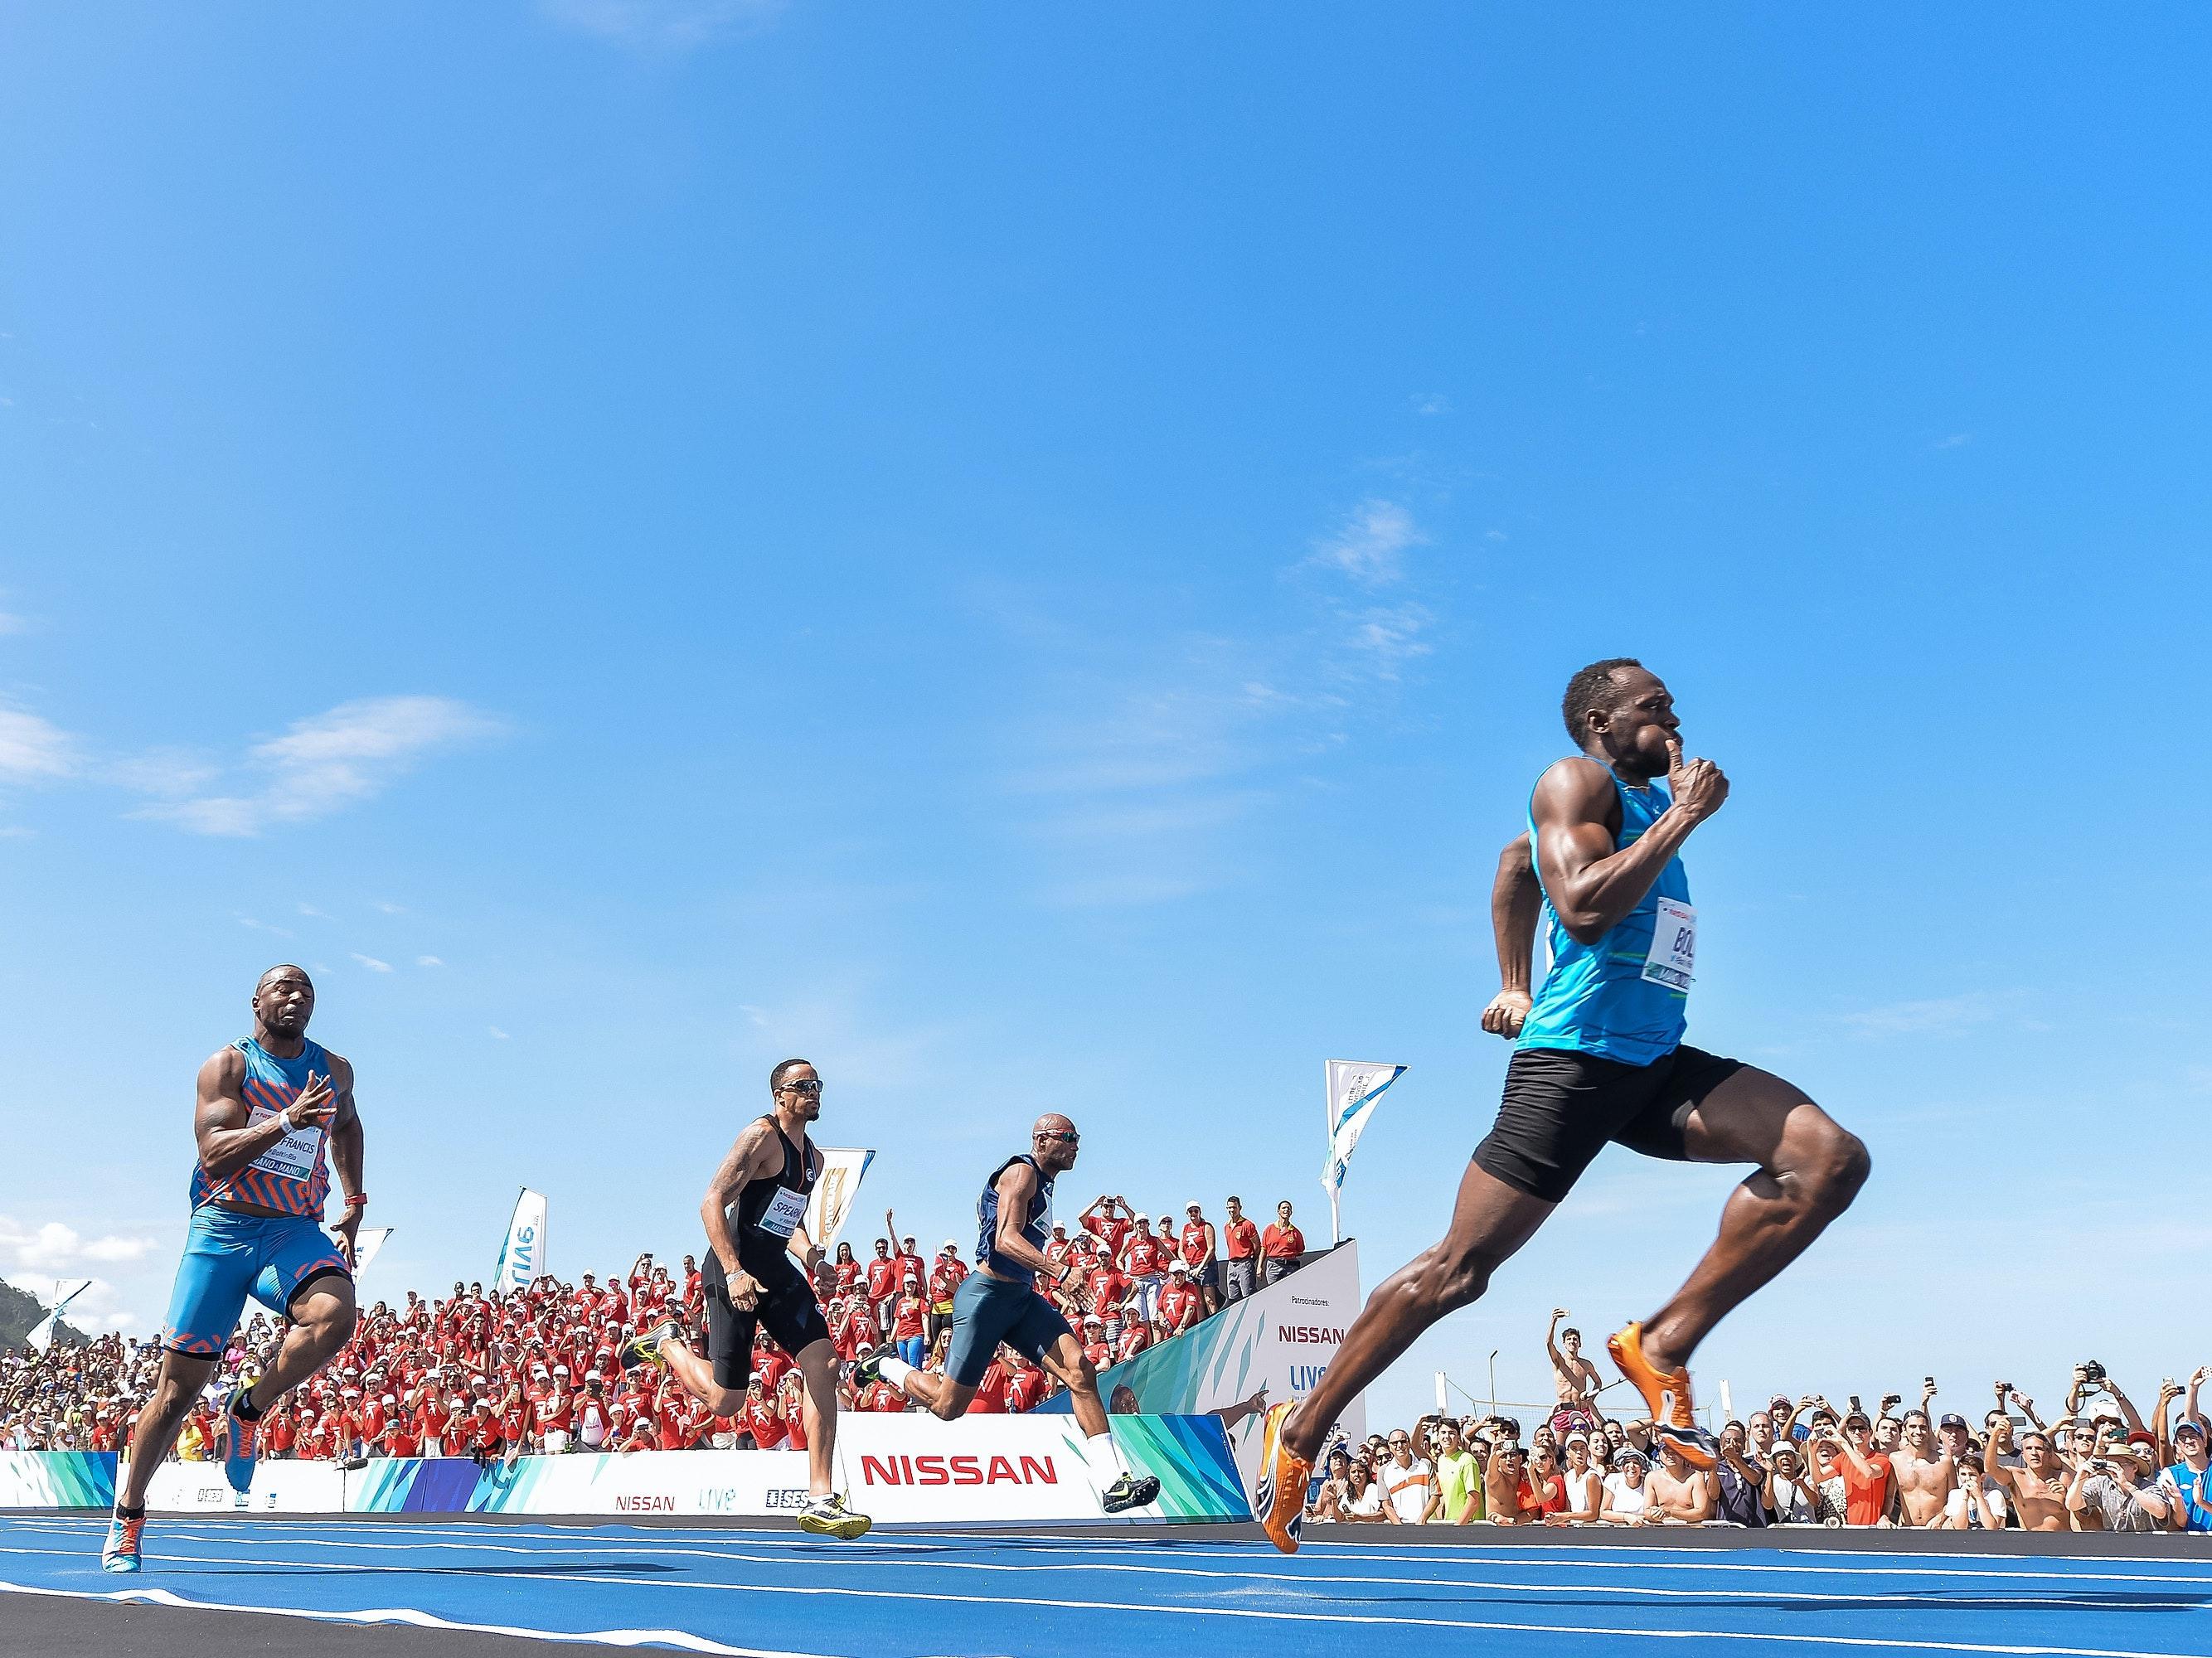 Usain Bolt of Jamaica runs to win the 'Mano a Mano' Men's 100m challenge at Copacabana beach on August 17, 2014 in Rio de Janeiro, Brazil.